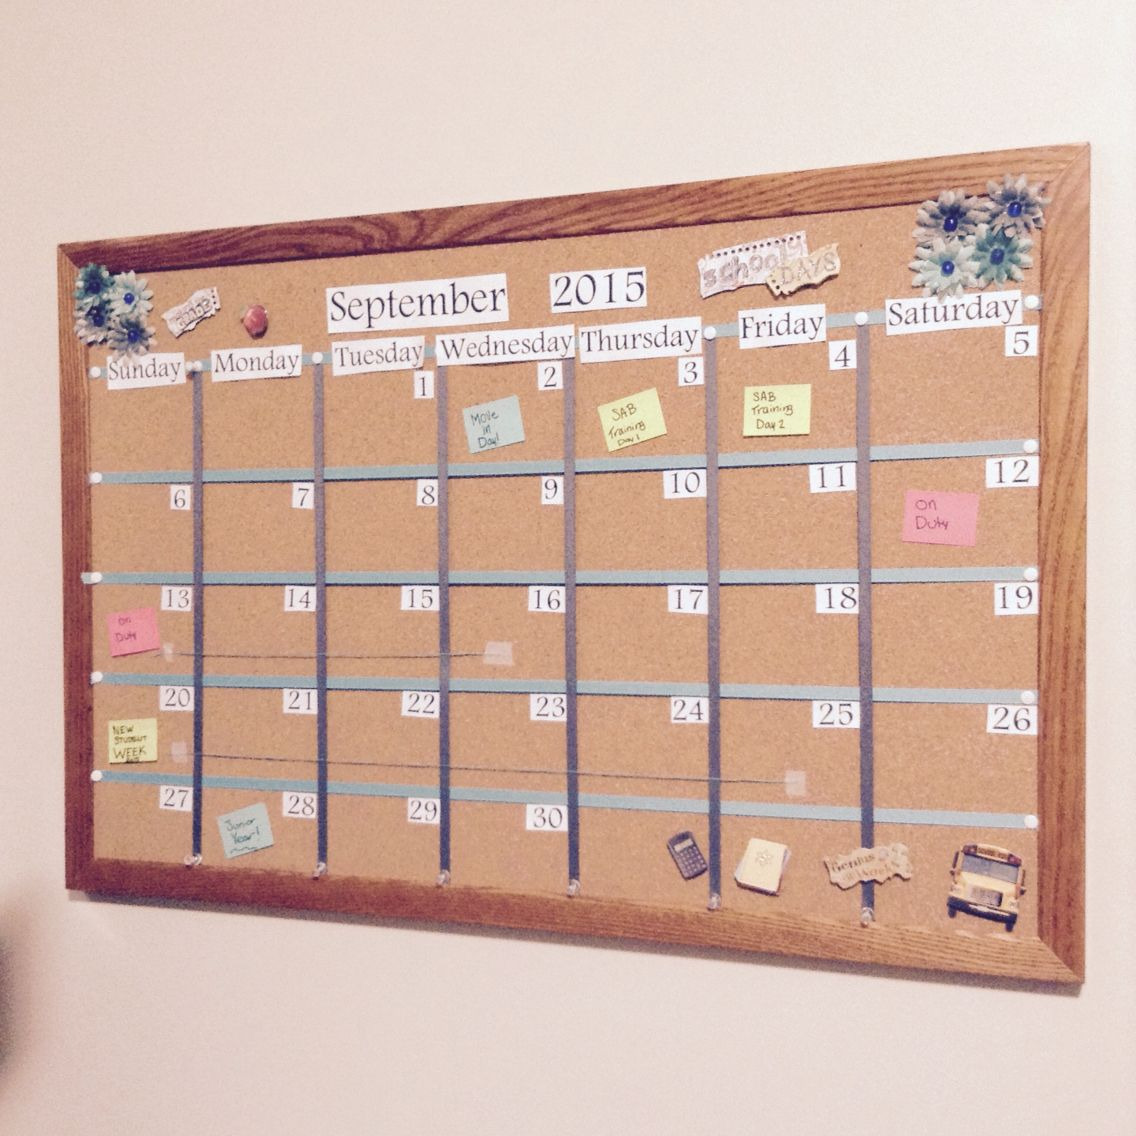 Dorm Room Cork Board Calendar College Dorm Cork Board Dorm